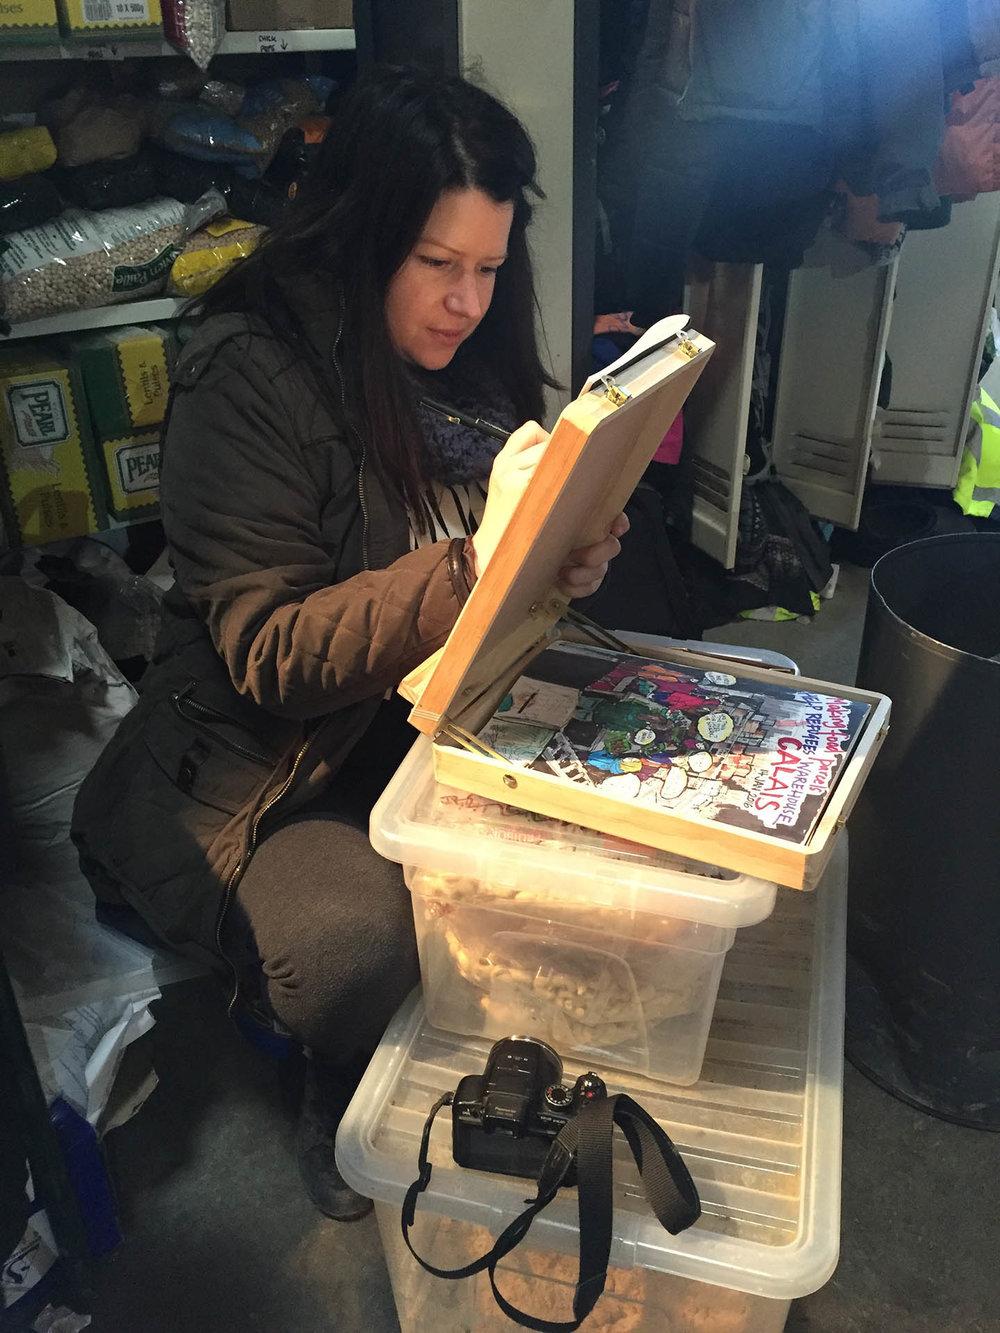 Niki illustrating for Help Refugees in Calais 2016